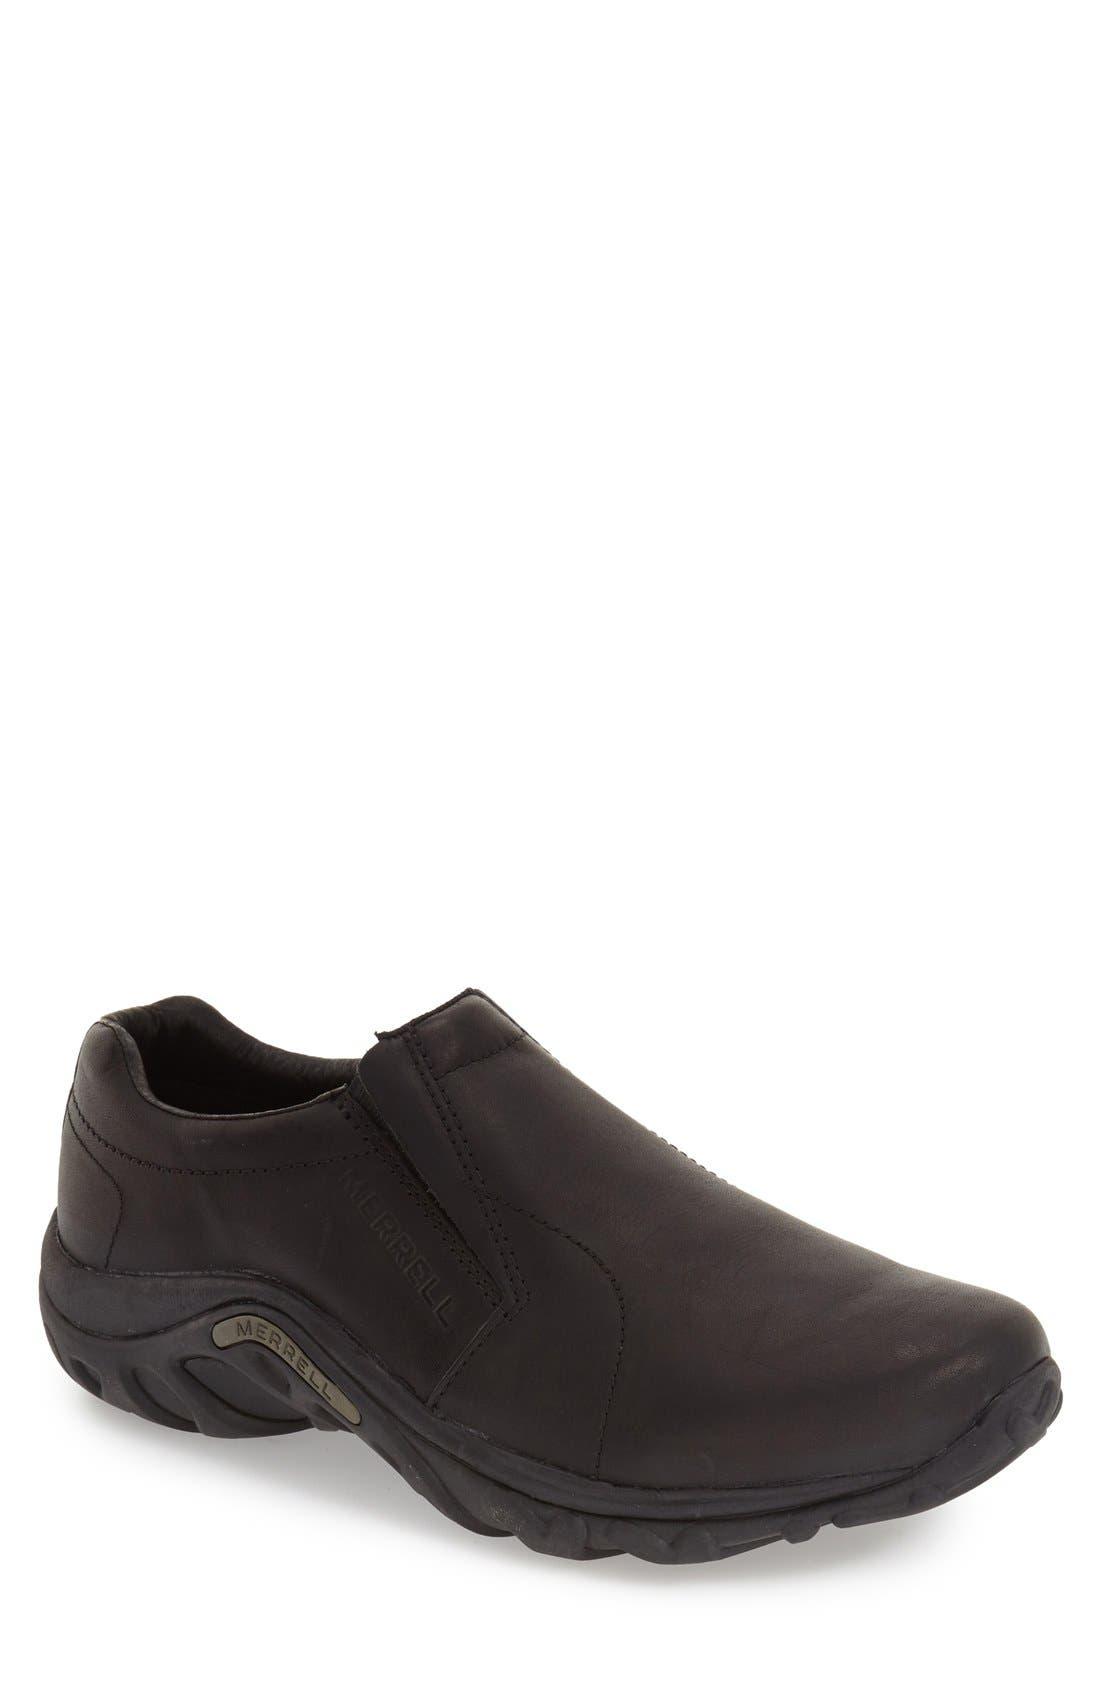 Merrell 'Jungle Moc' Leather Athletic Slip-On (Men)